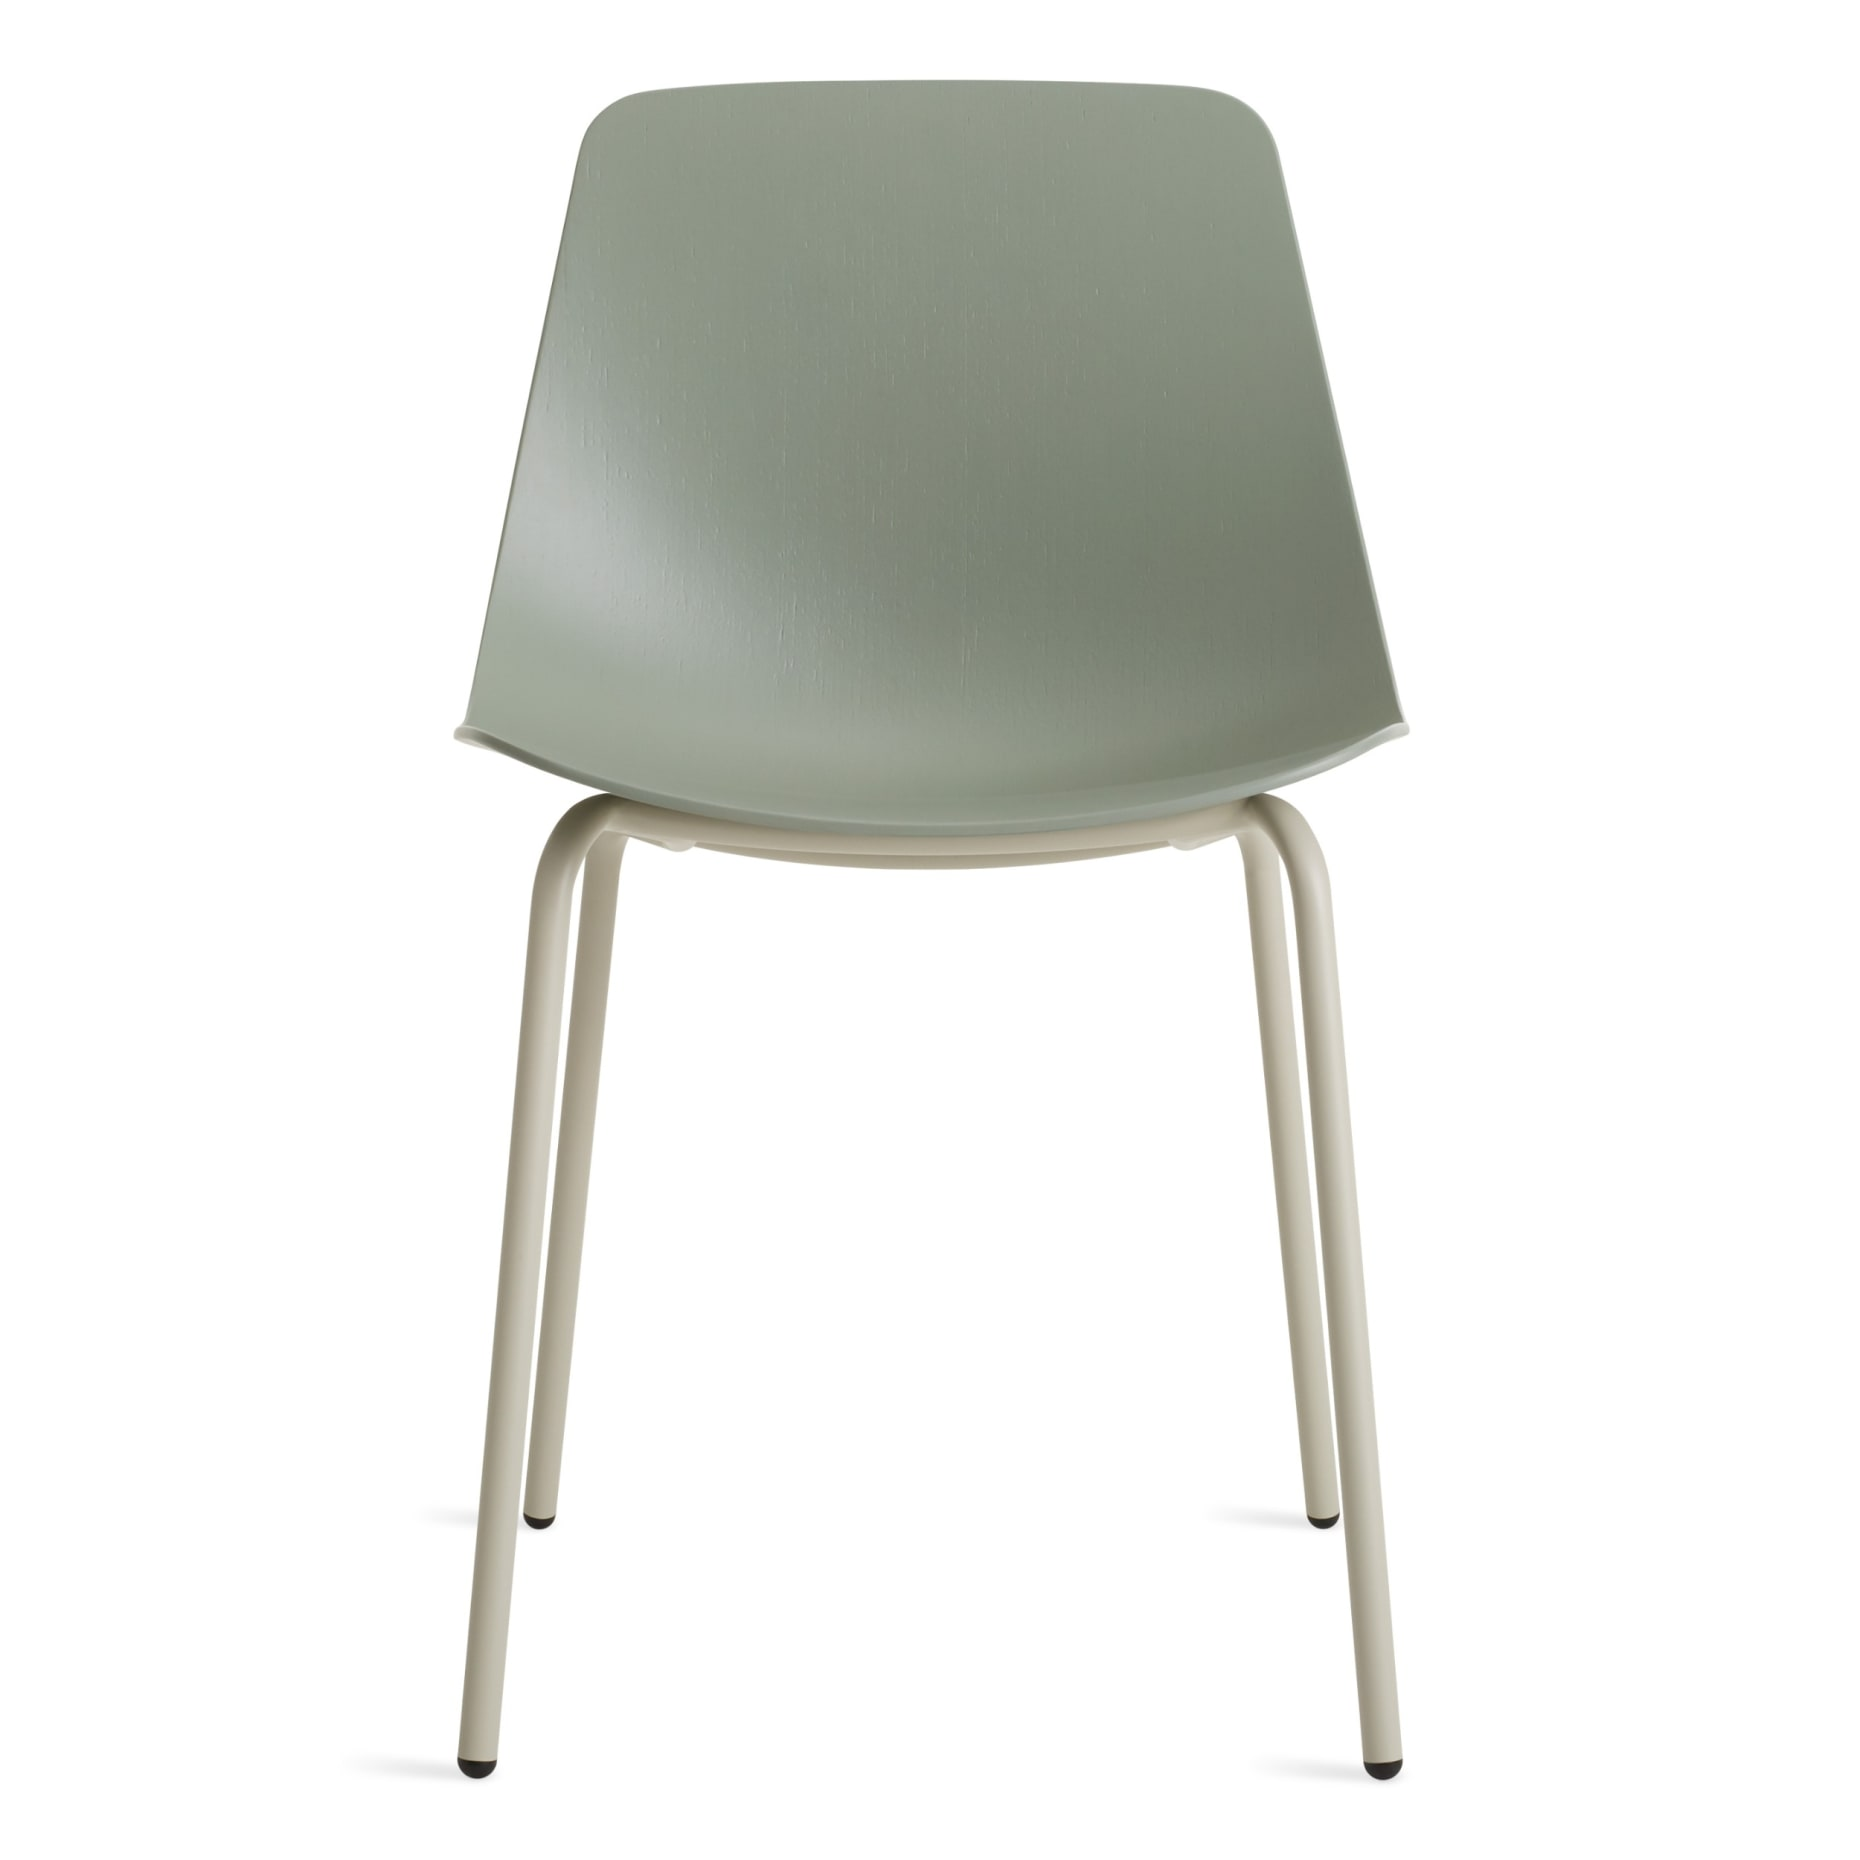 cu1 dinchr gg clean cut dining chair grey green